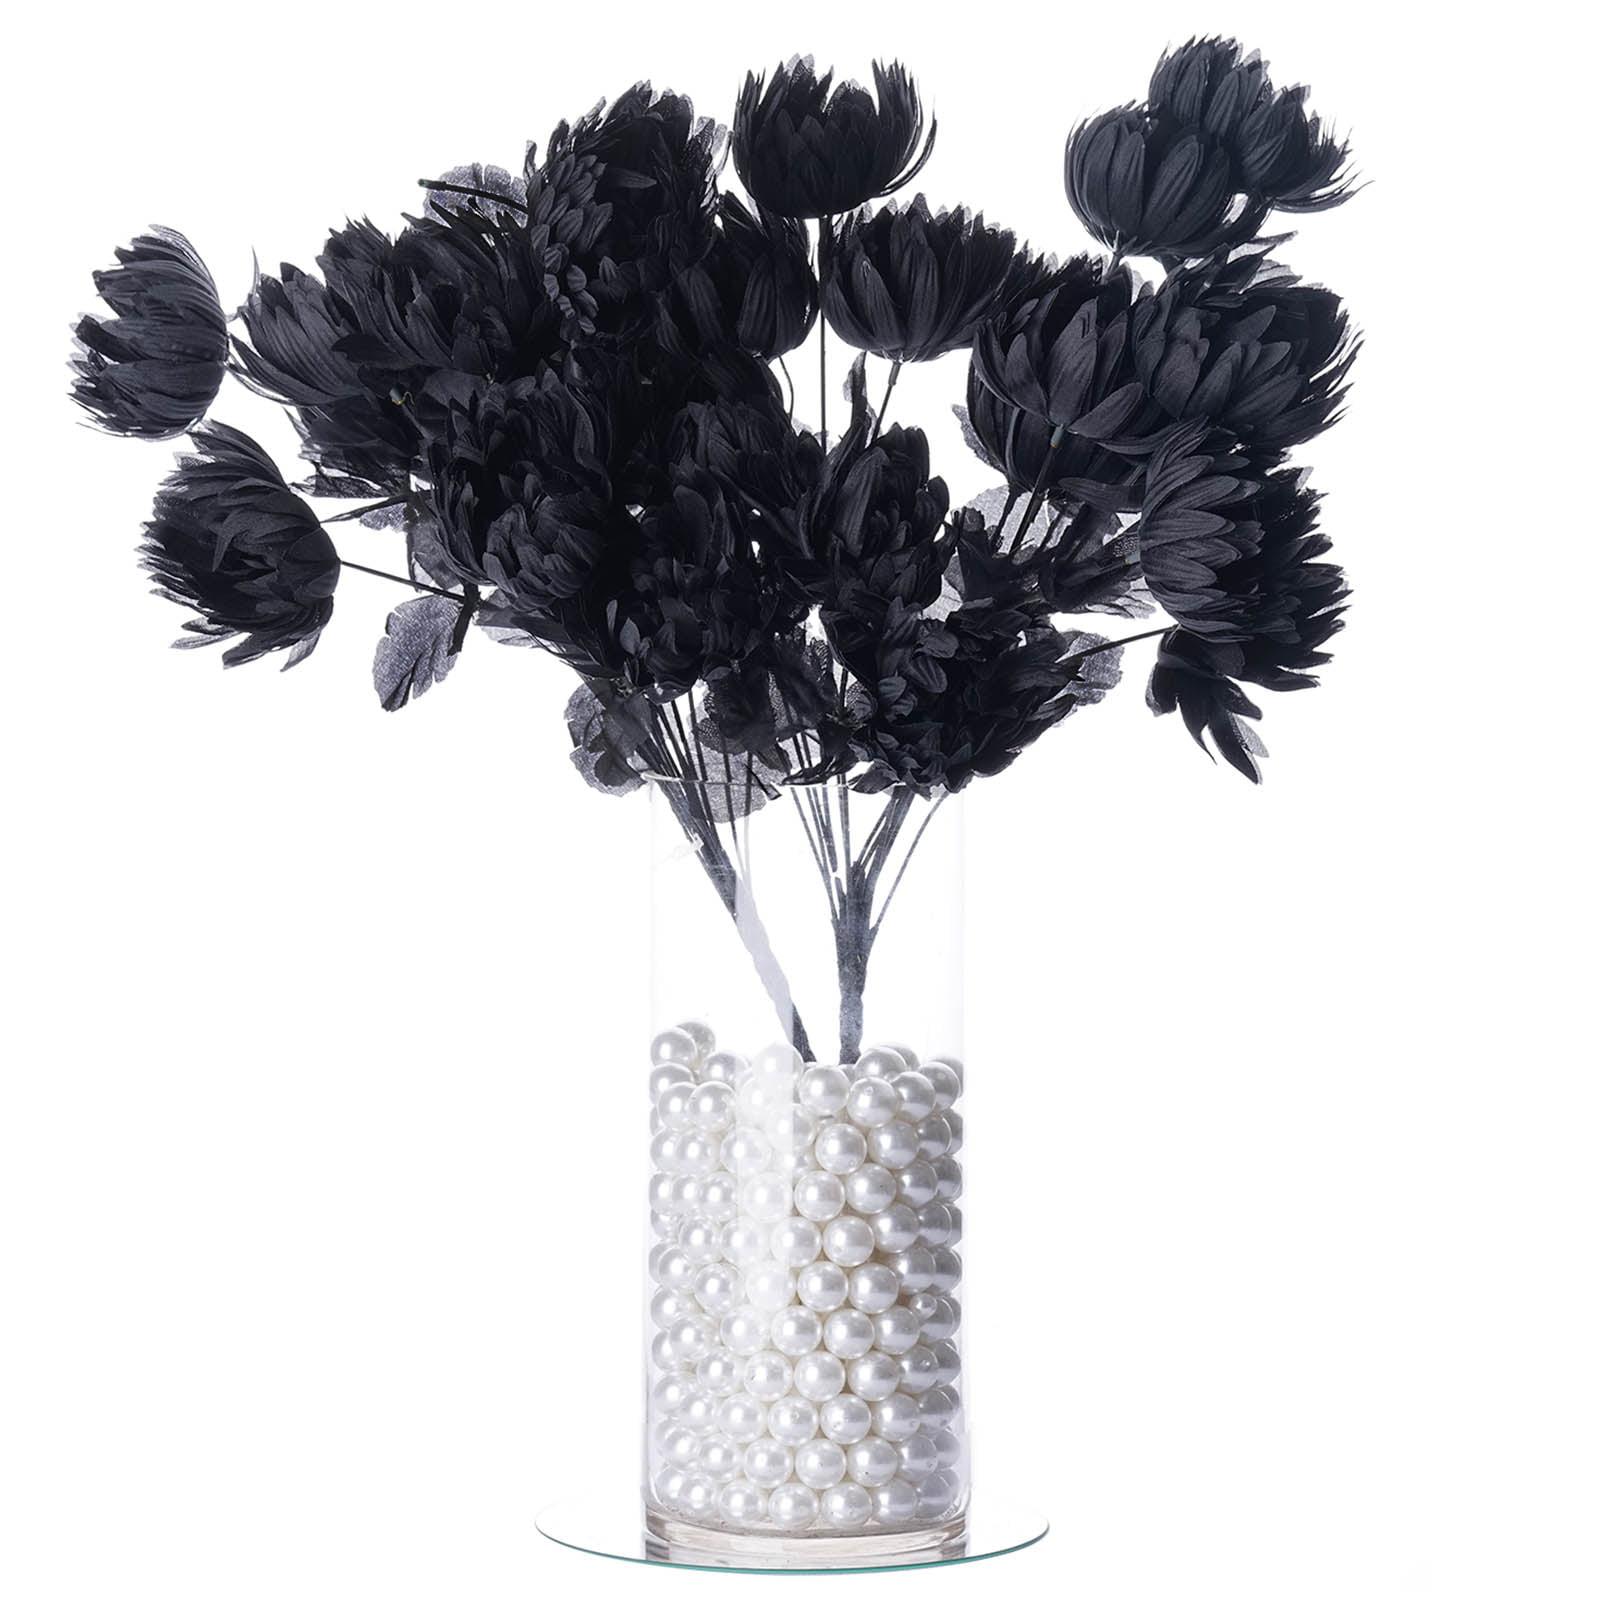 Balsacircle 56 Chrysanthemum Mums Silk Flowers For Wedding Party